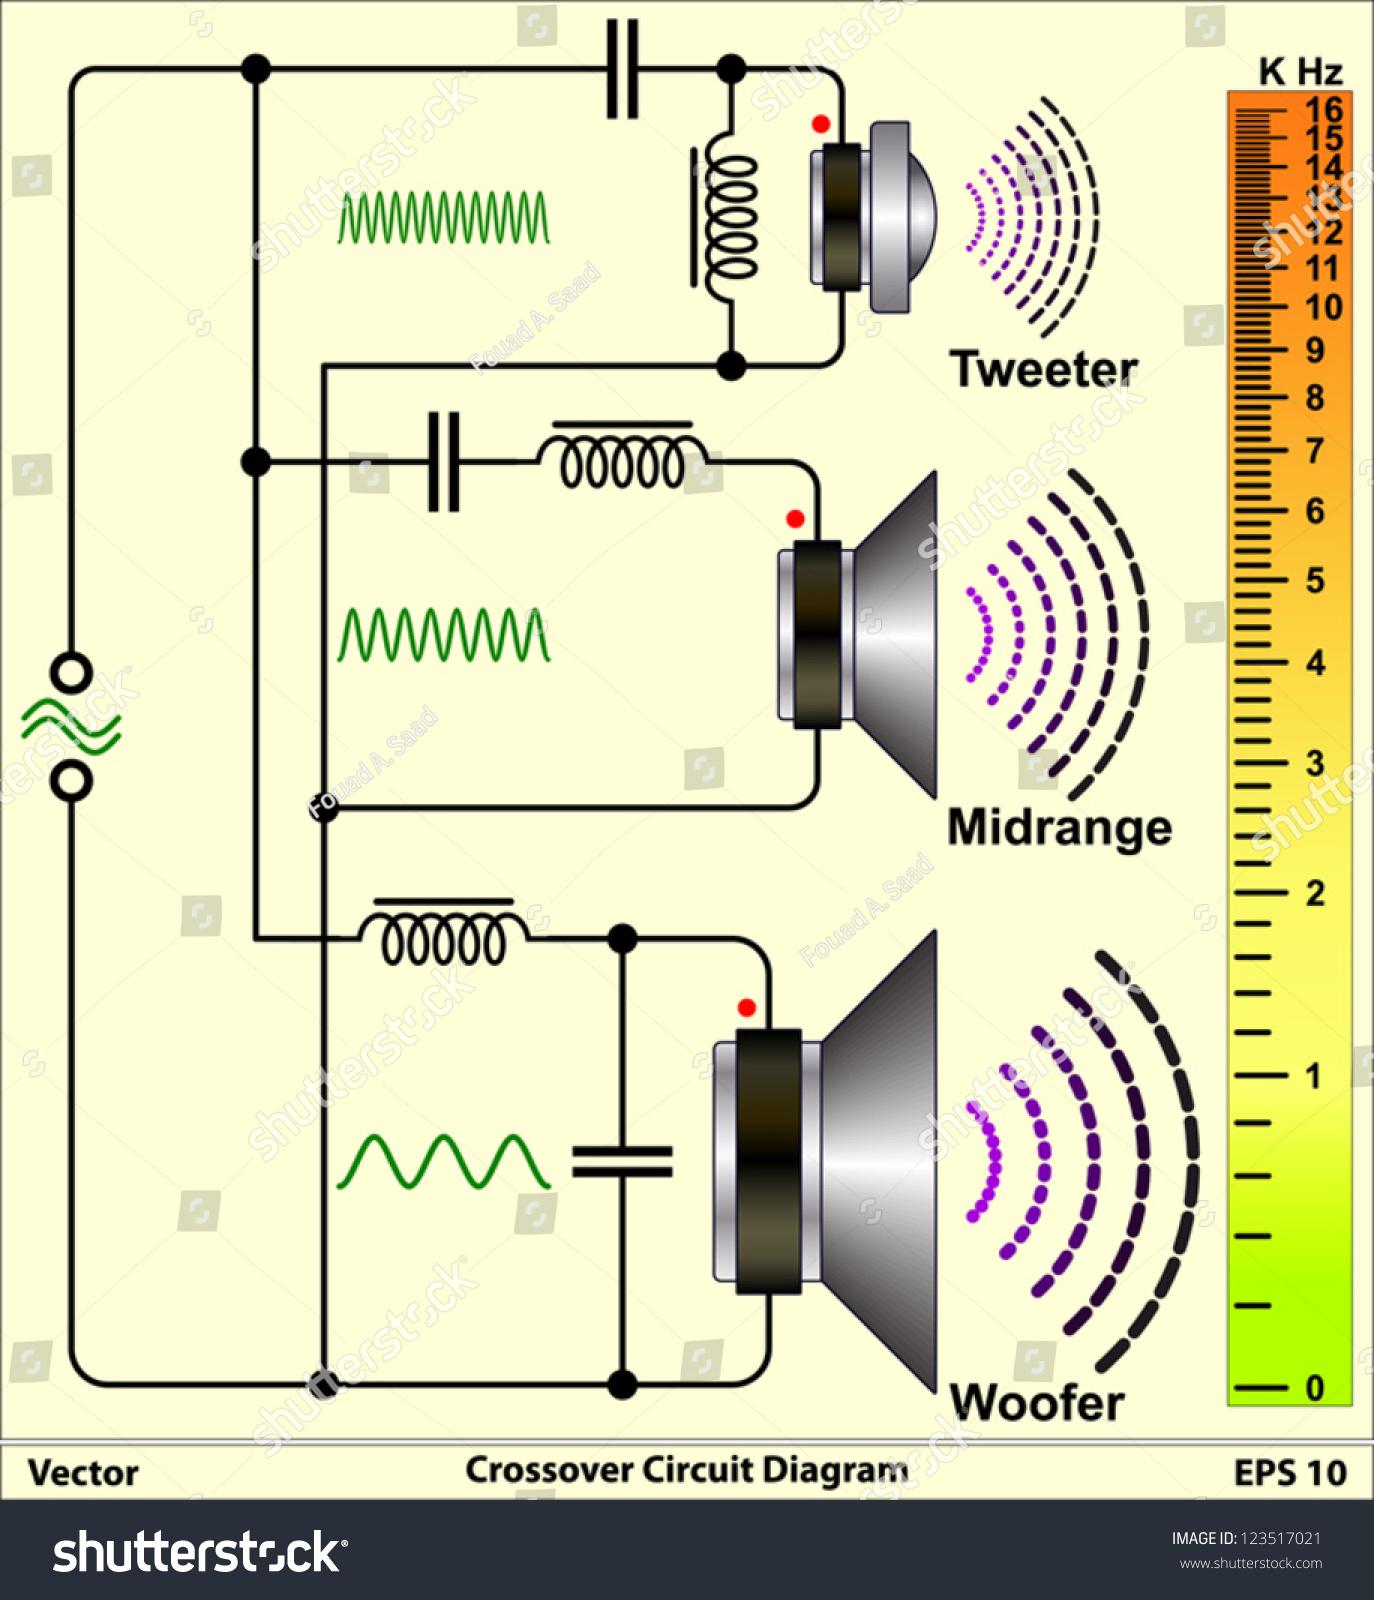 speaker crossovers circuit diagram stock photo 123517021. Black Bedroom Furniture Sets. Home Design Ideas